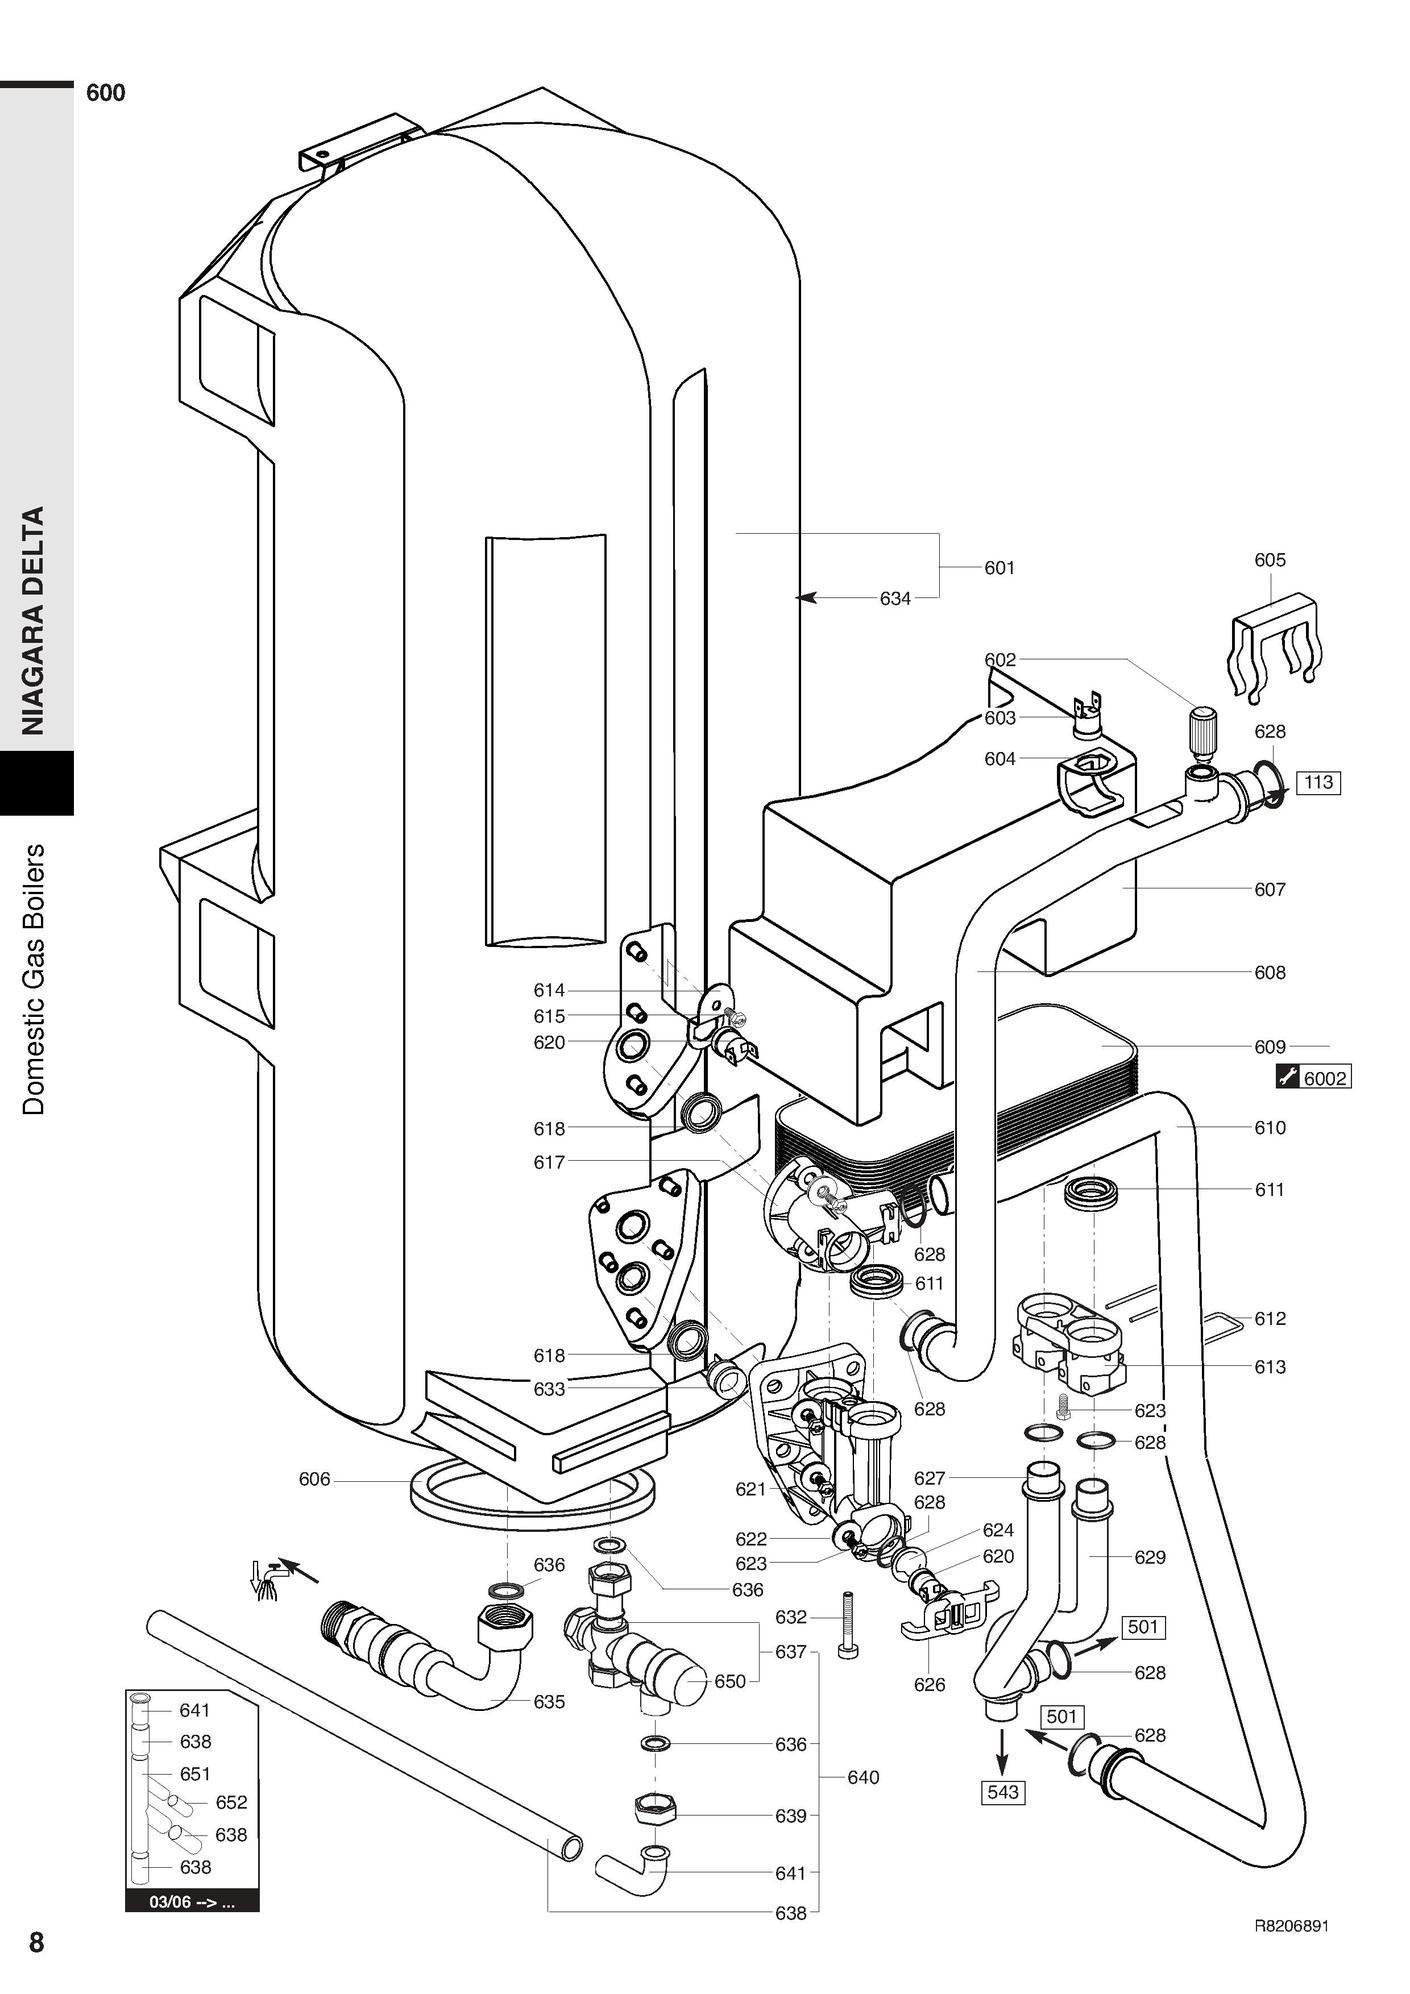 recherche directe dans la vue clat e de la nomenclature chaudi re chaffoteaux niagara delta 30. Black Bedroom Furniture Sets. Home Design Ideas